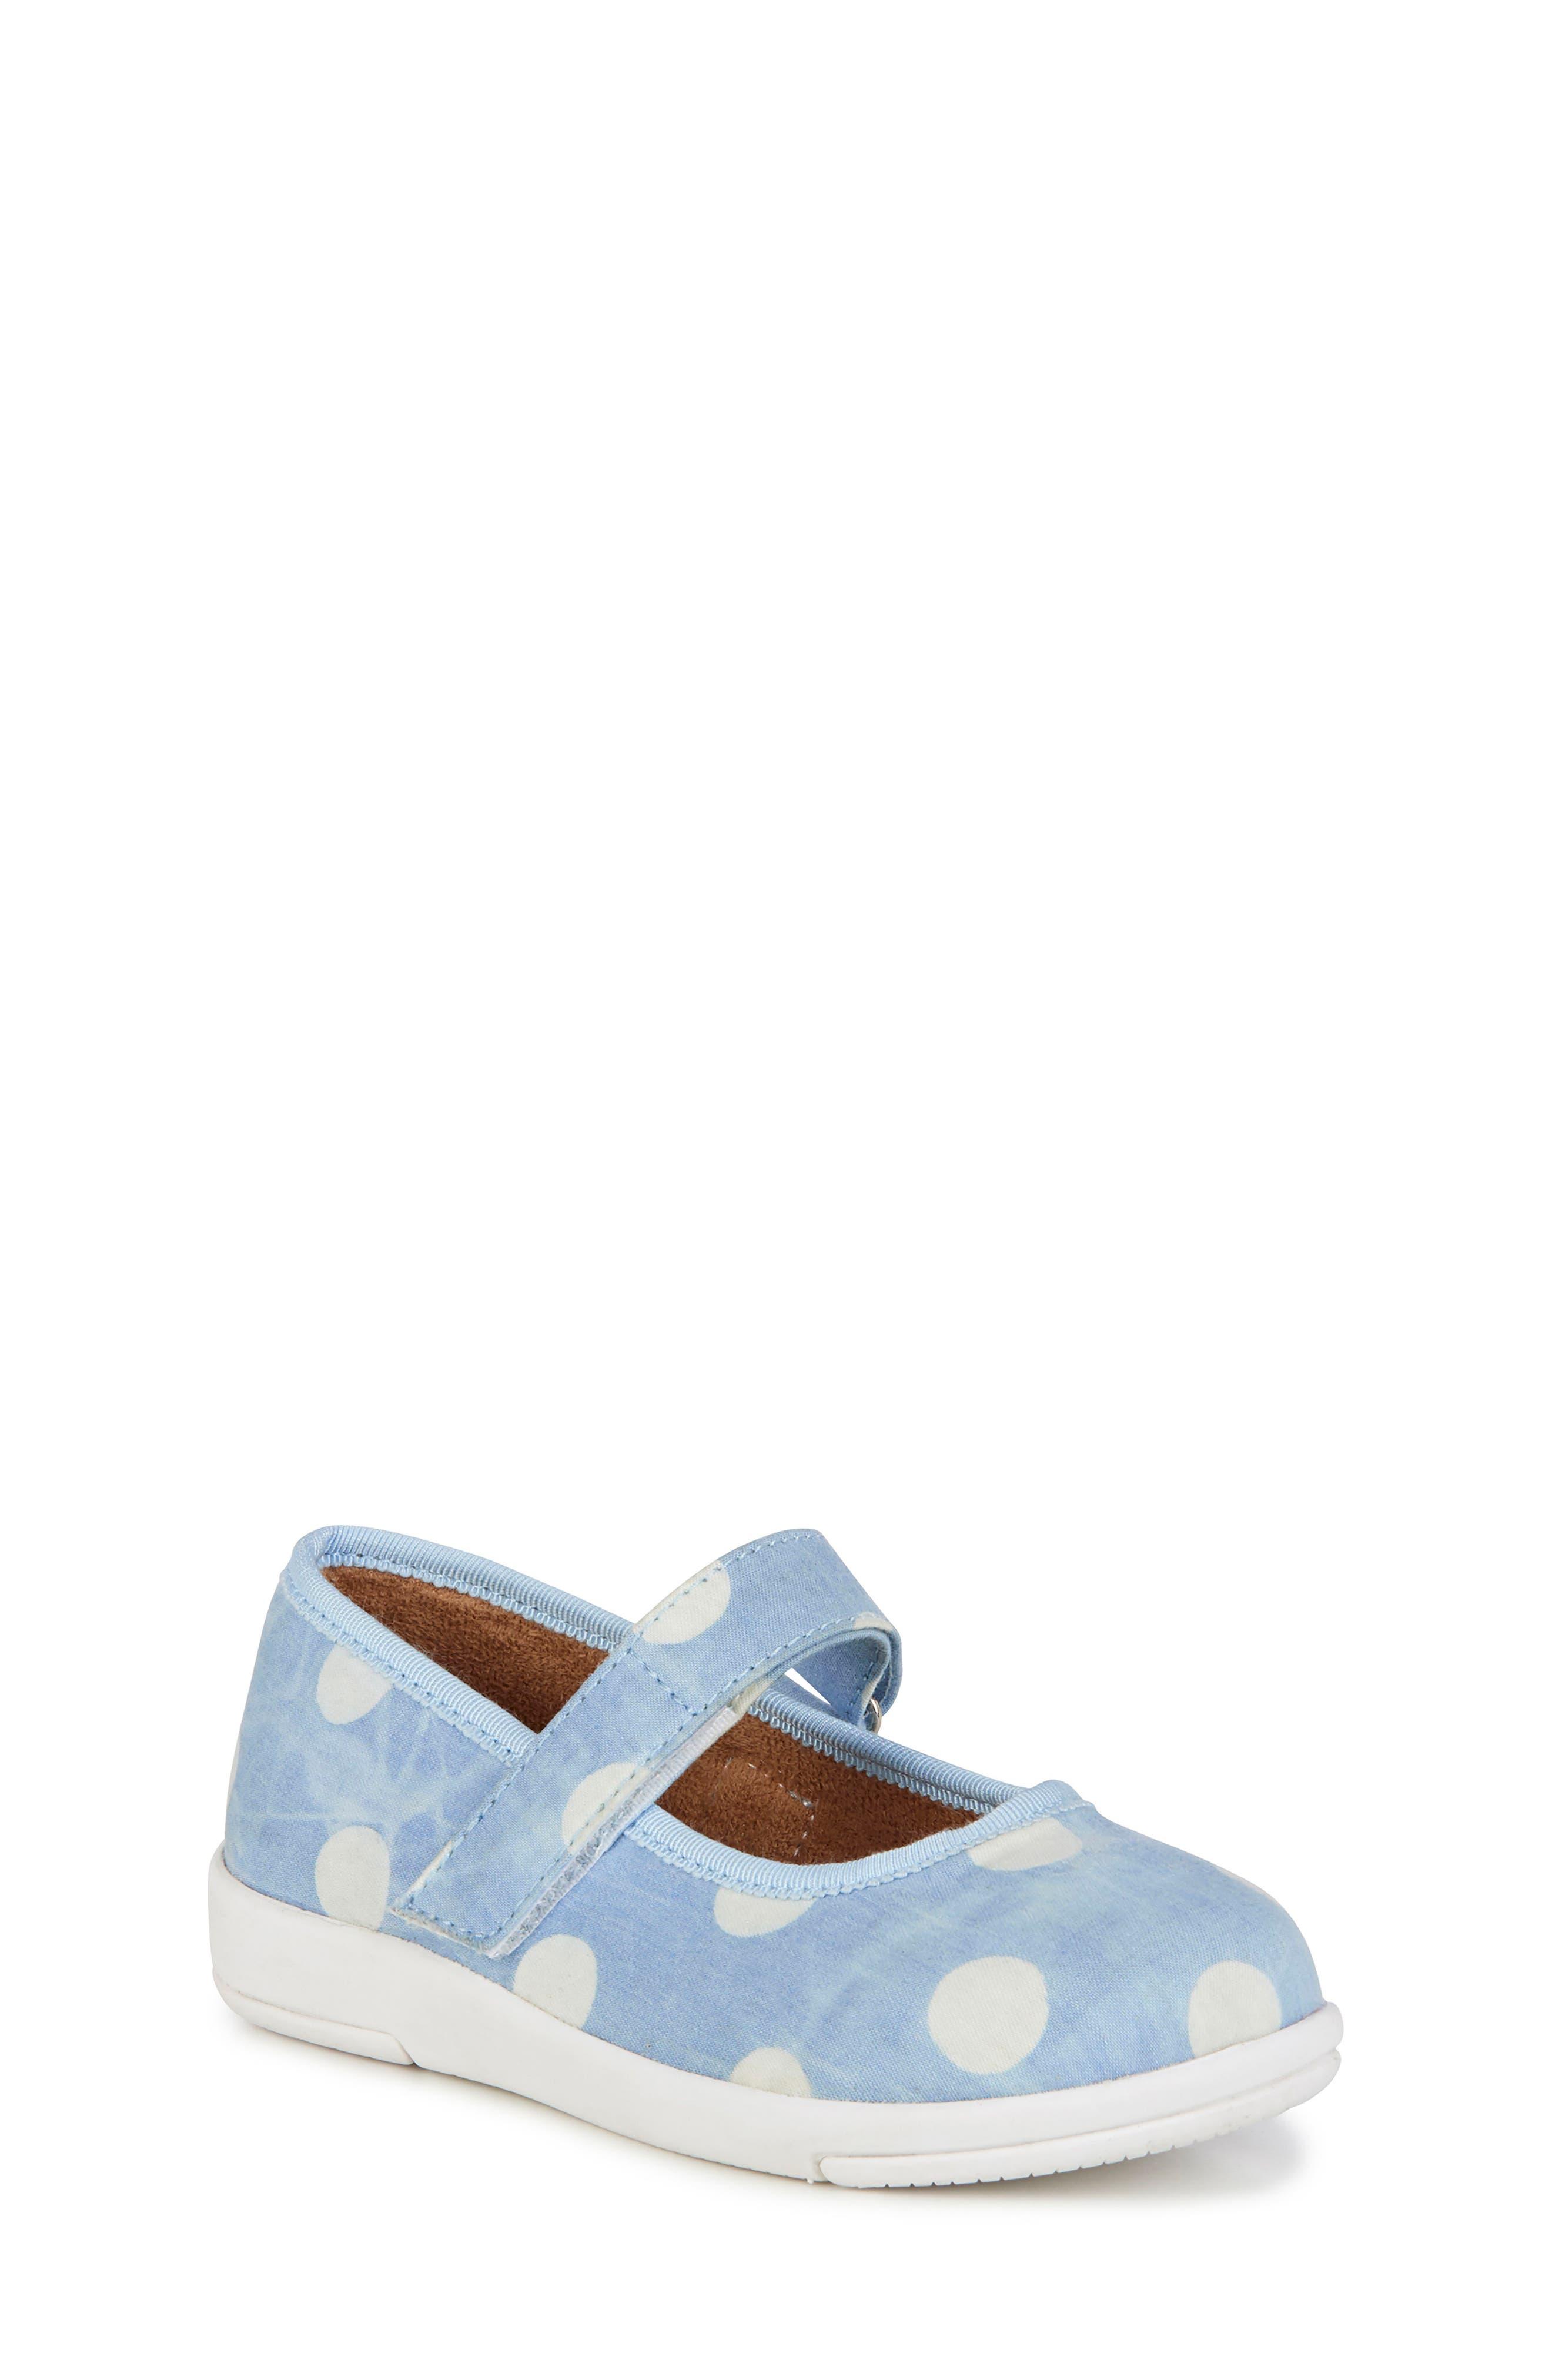 Deena Mary Jane Sneaker,                         Main,                         color, SPOT LIGHT DENIM DISTRESS